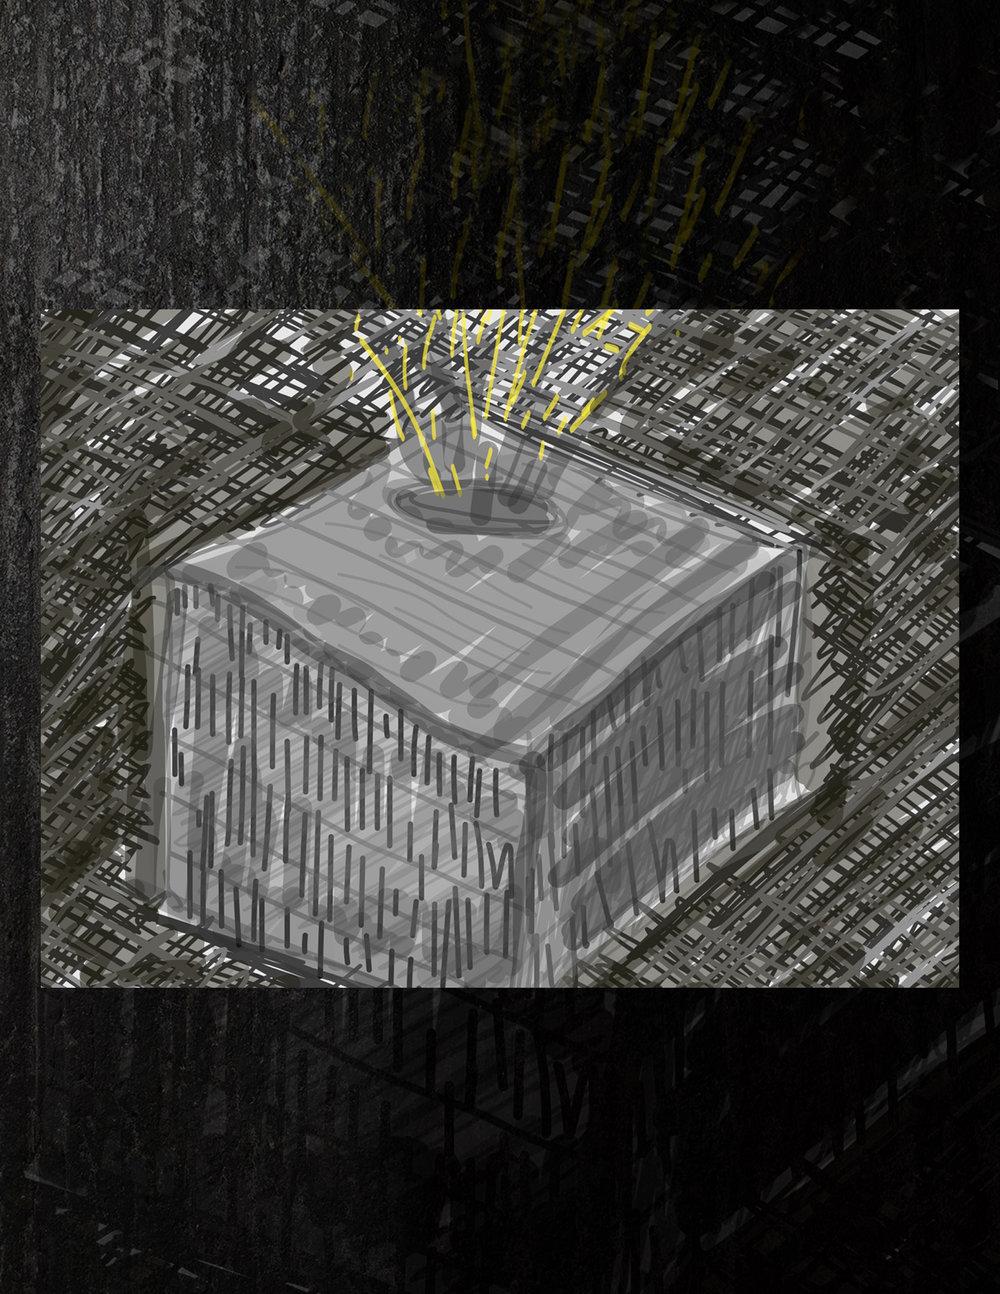 RB Firebox Image2.jpg